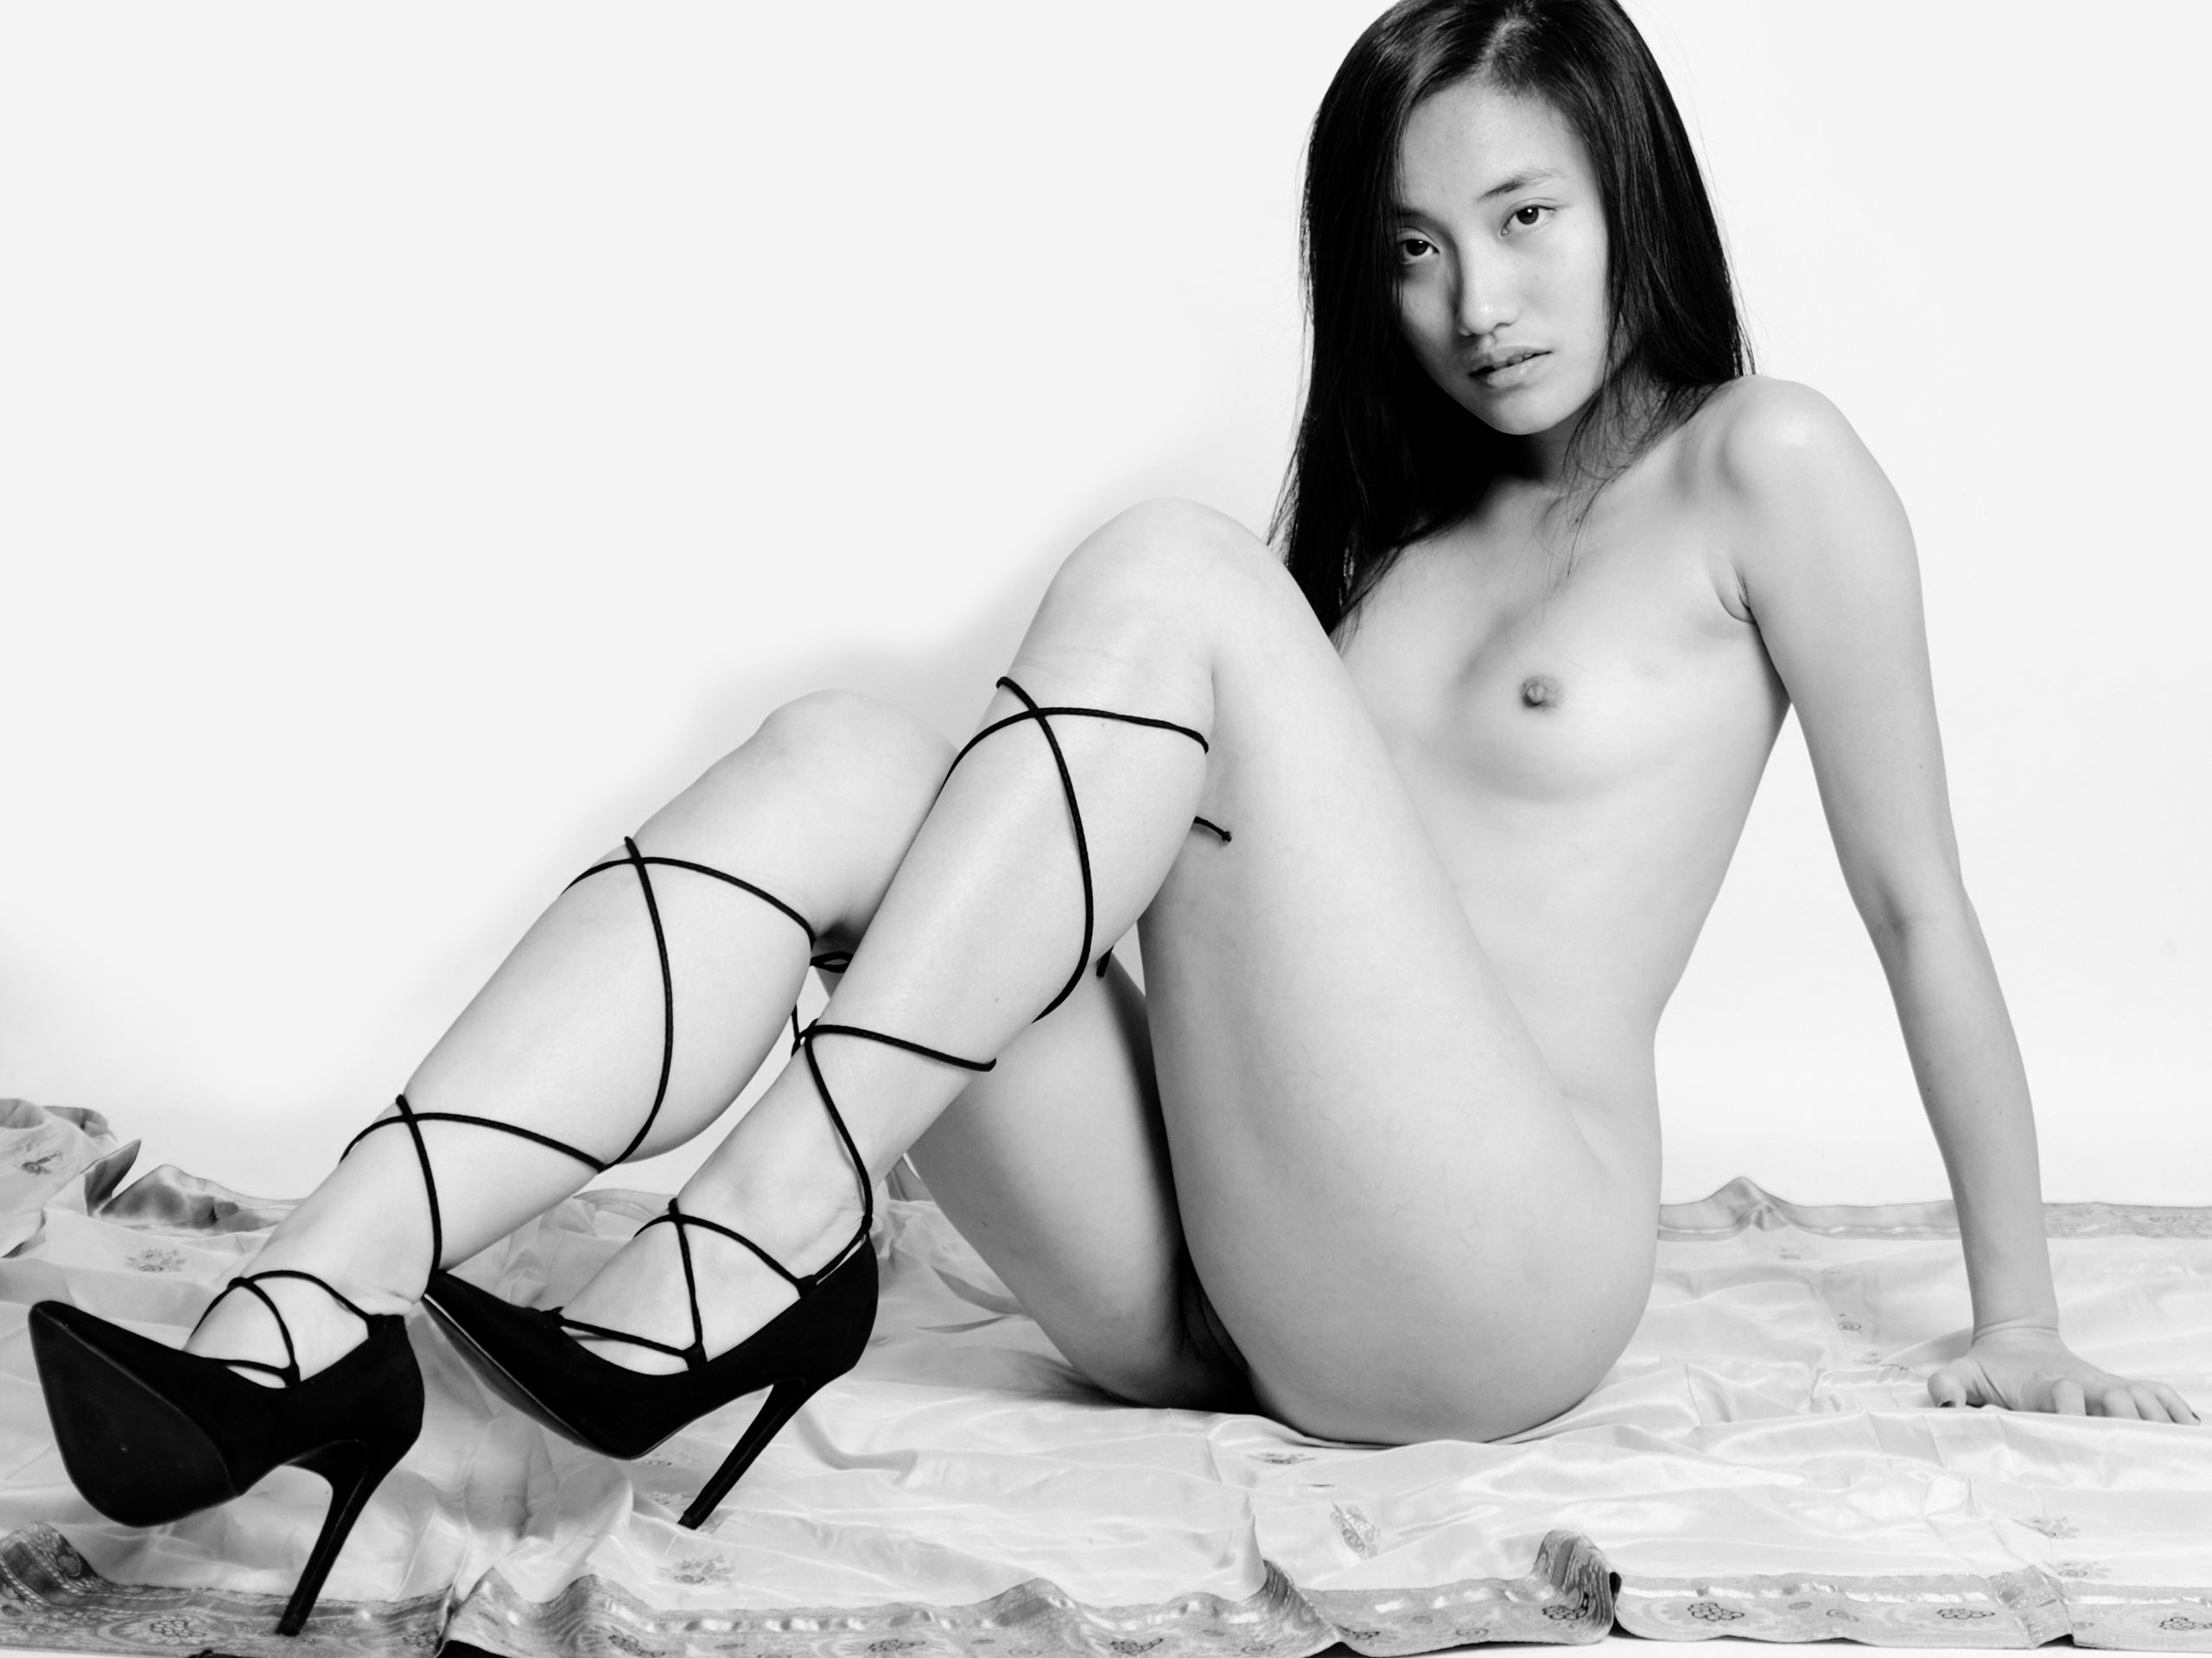 oriental nude girl